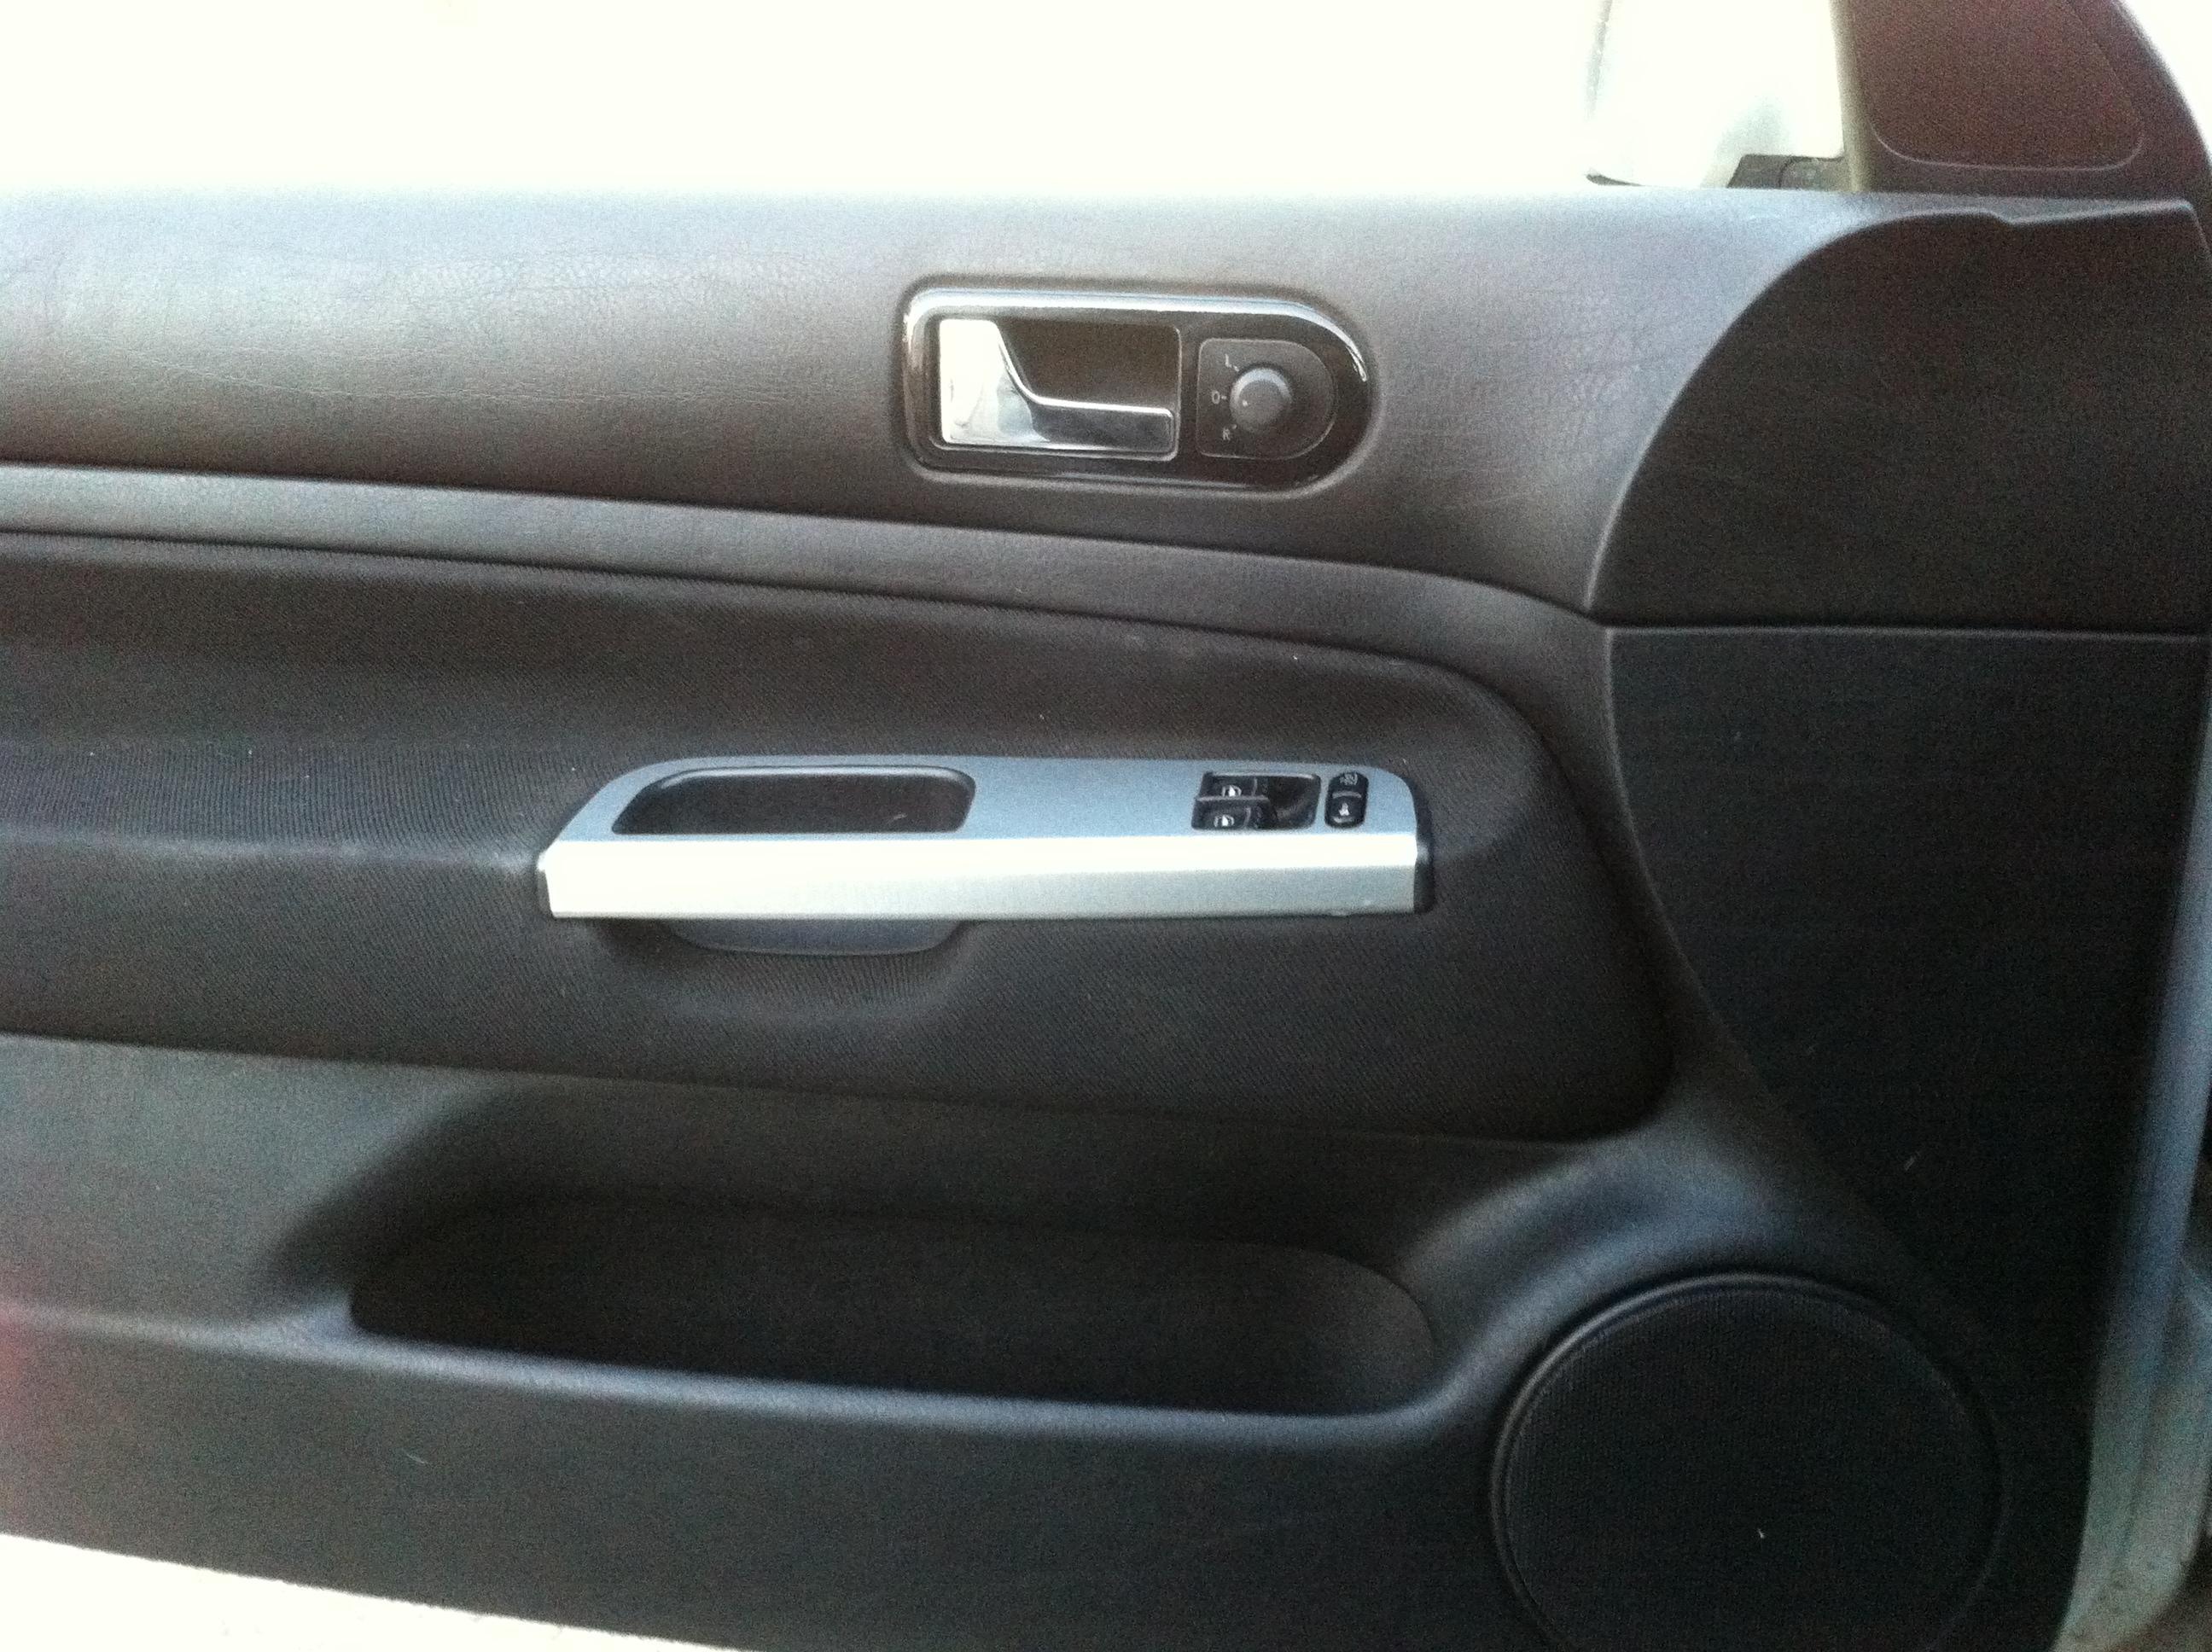 Golf 4 tdi 90 agr mfd monter cd dx 2011 2012 recu for Pieces interieur golf 4